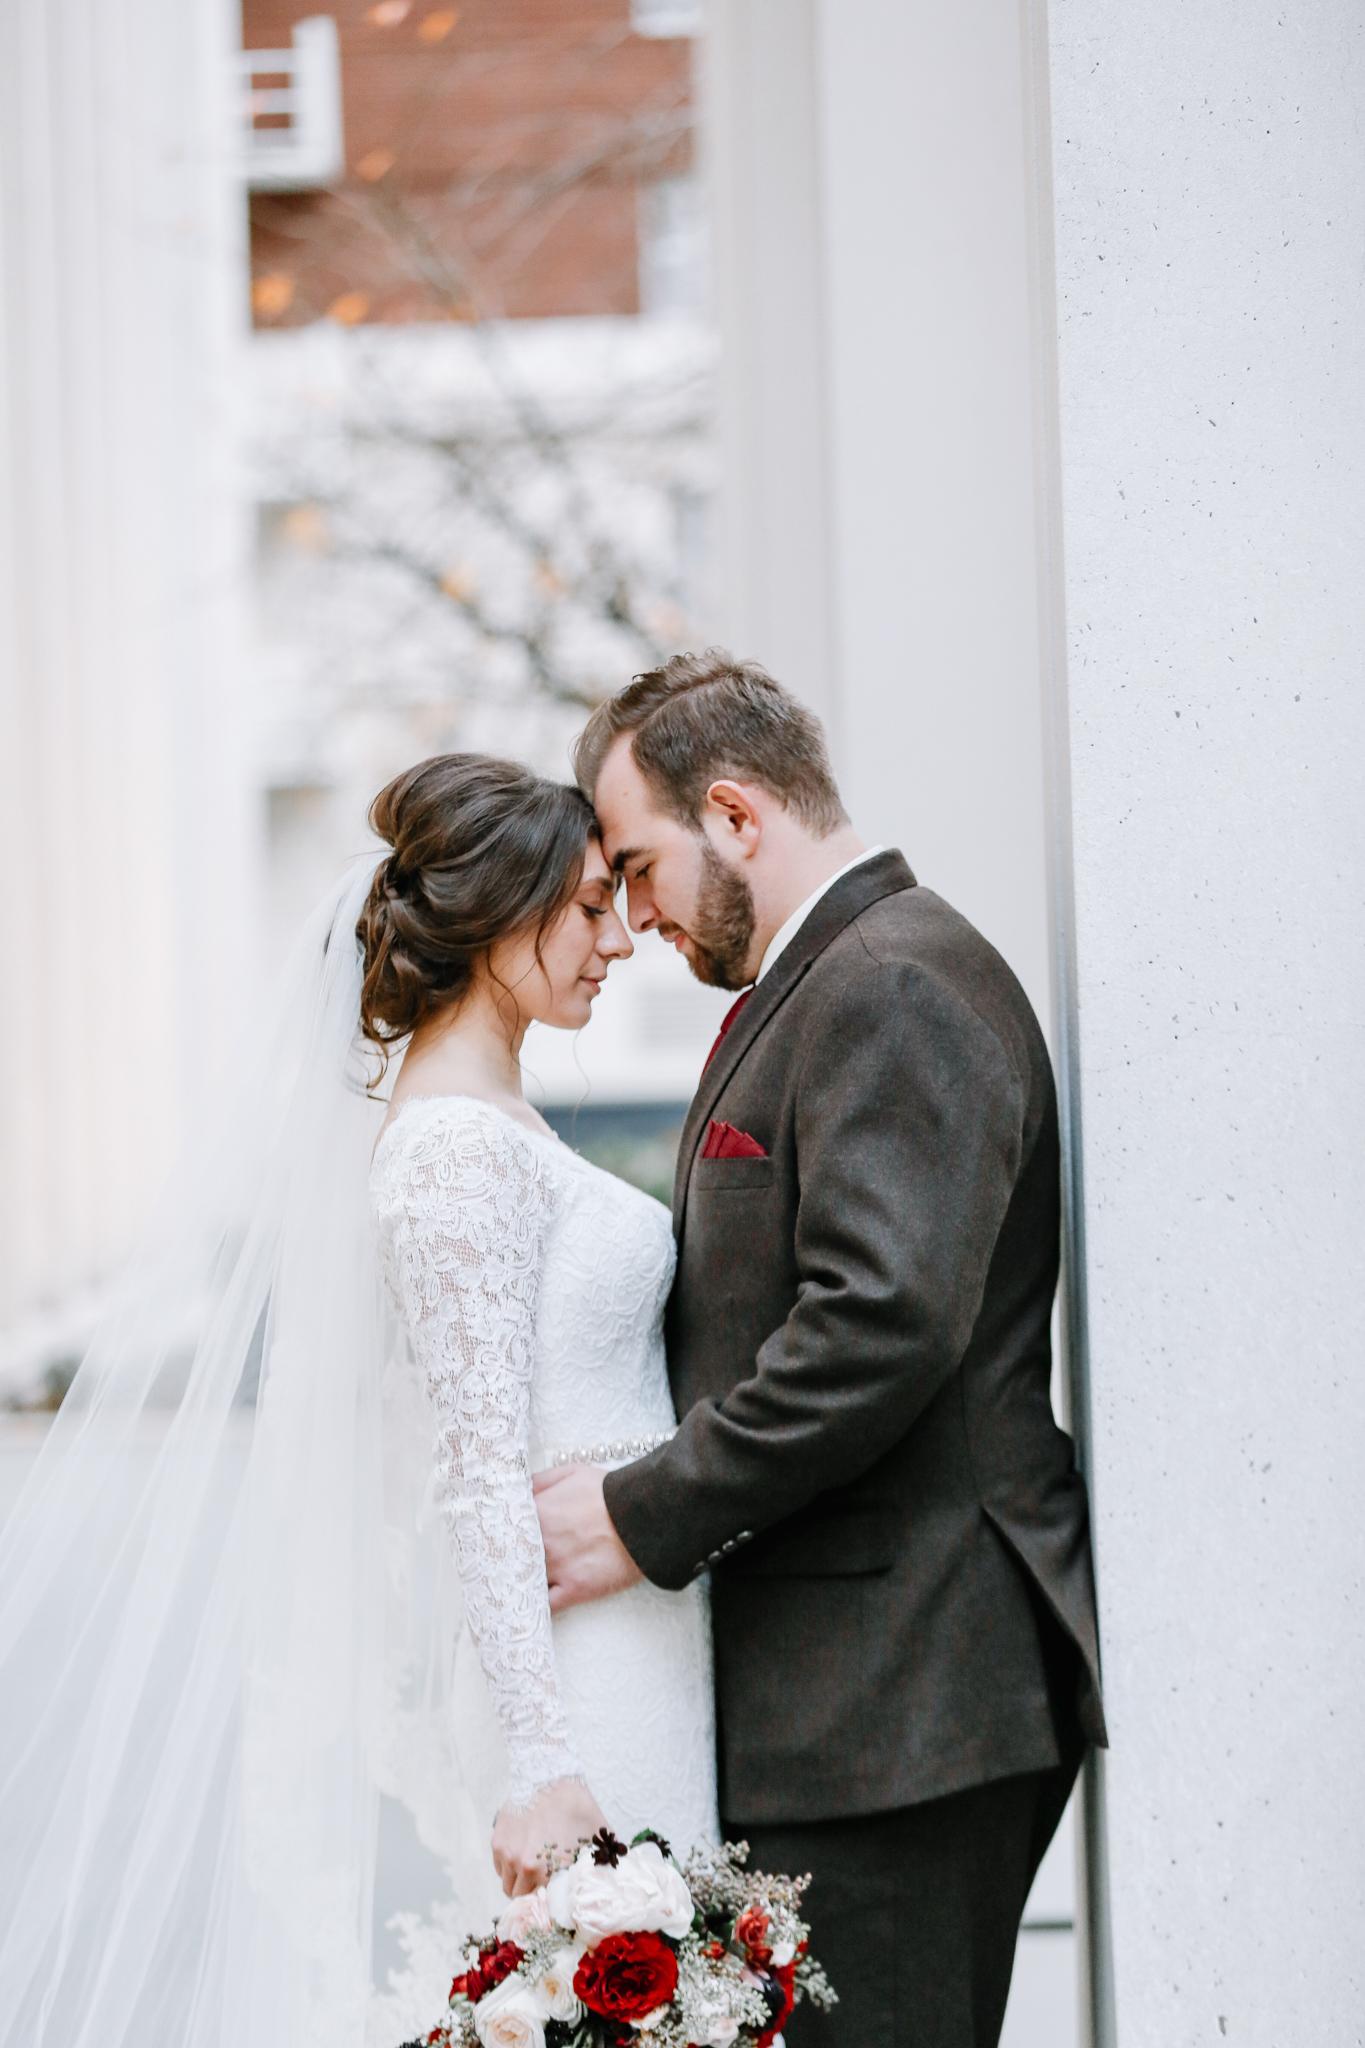 Manu and Laura - Portland Wedding Photographer - 83.jpg